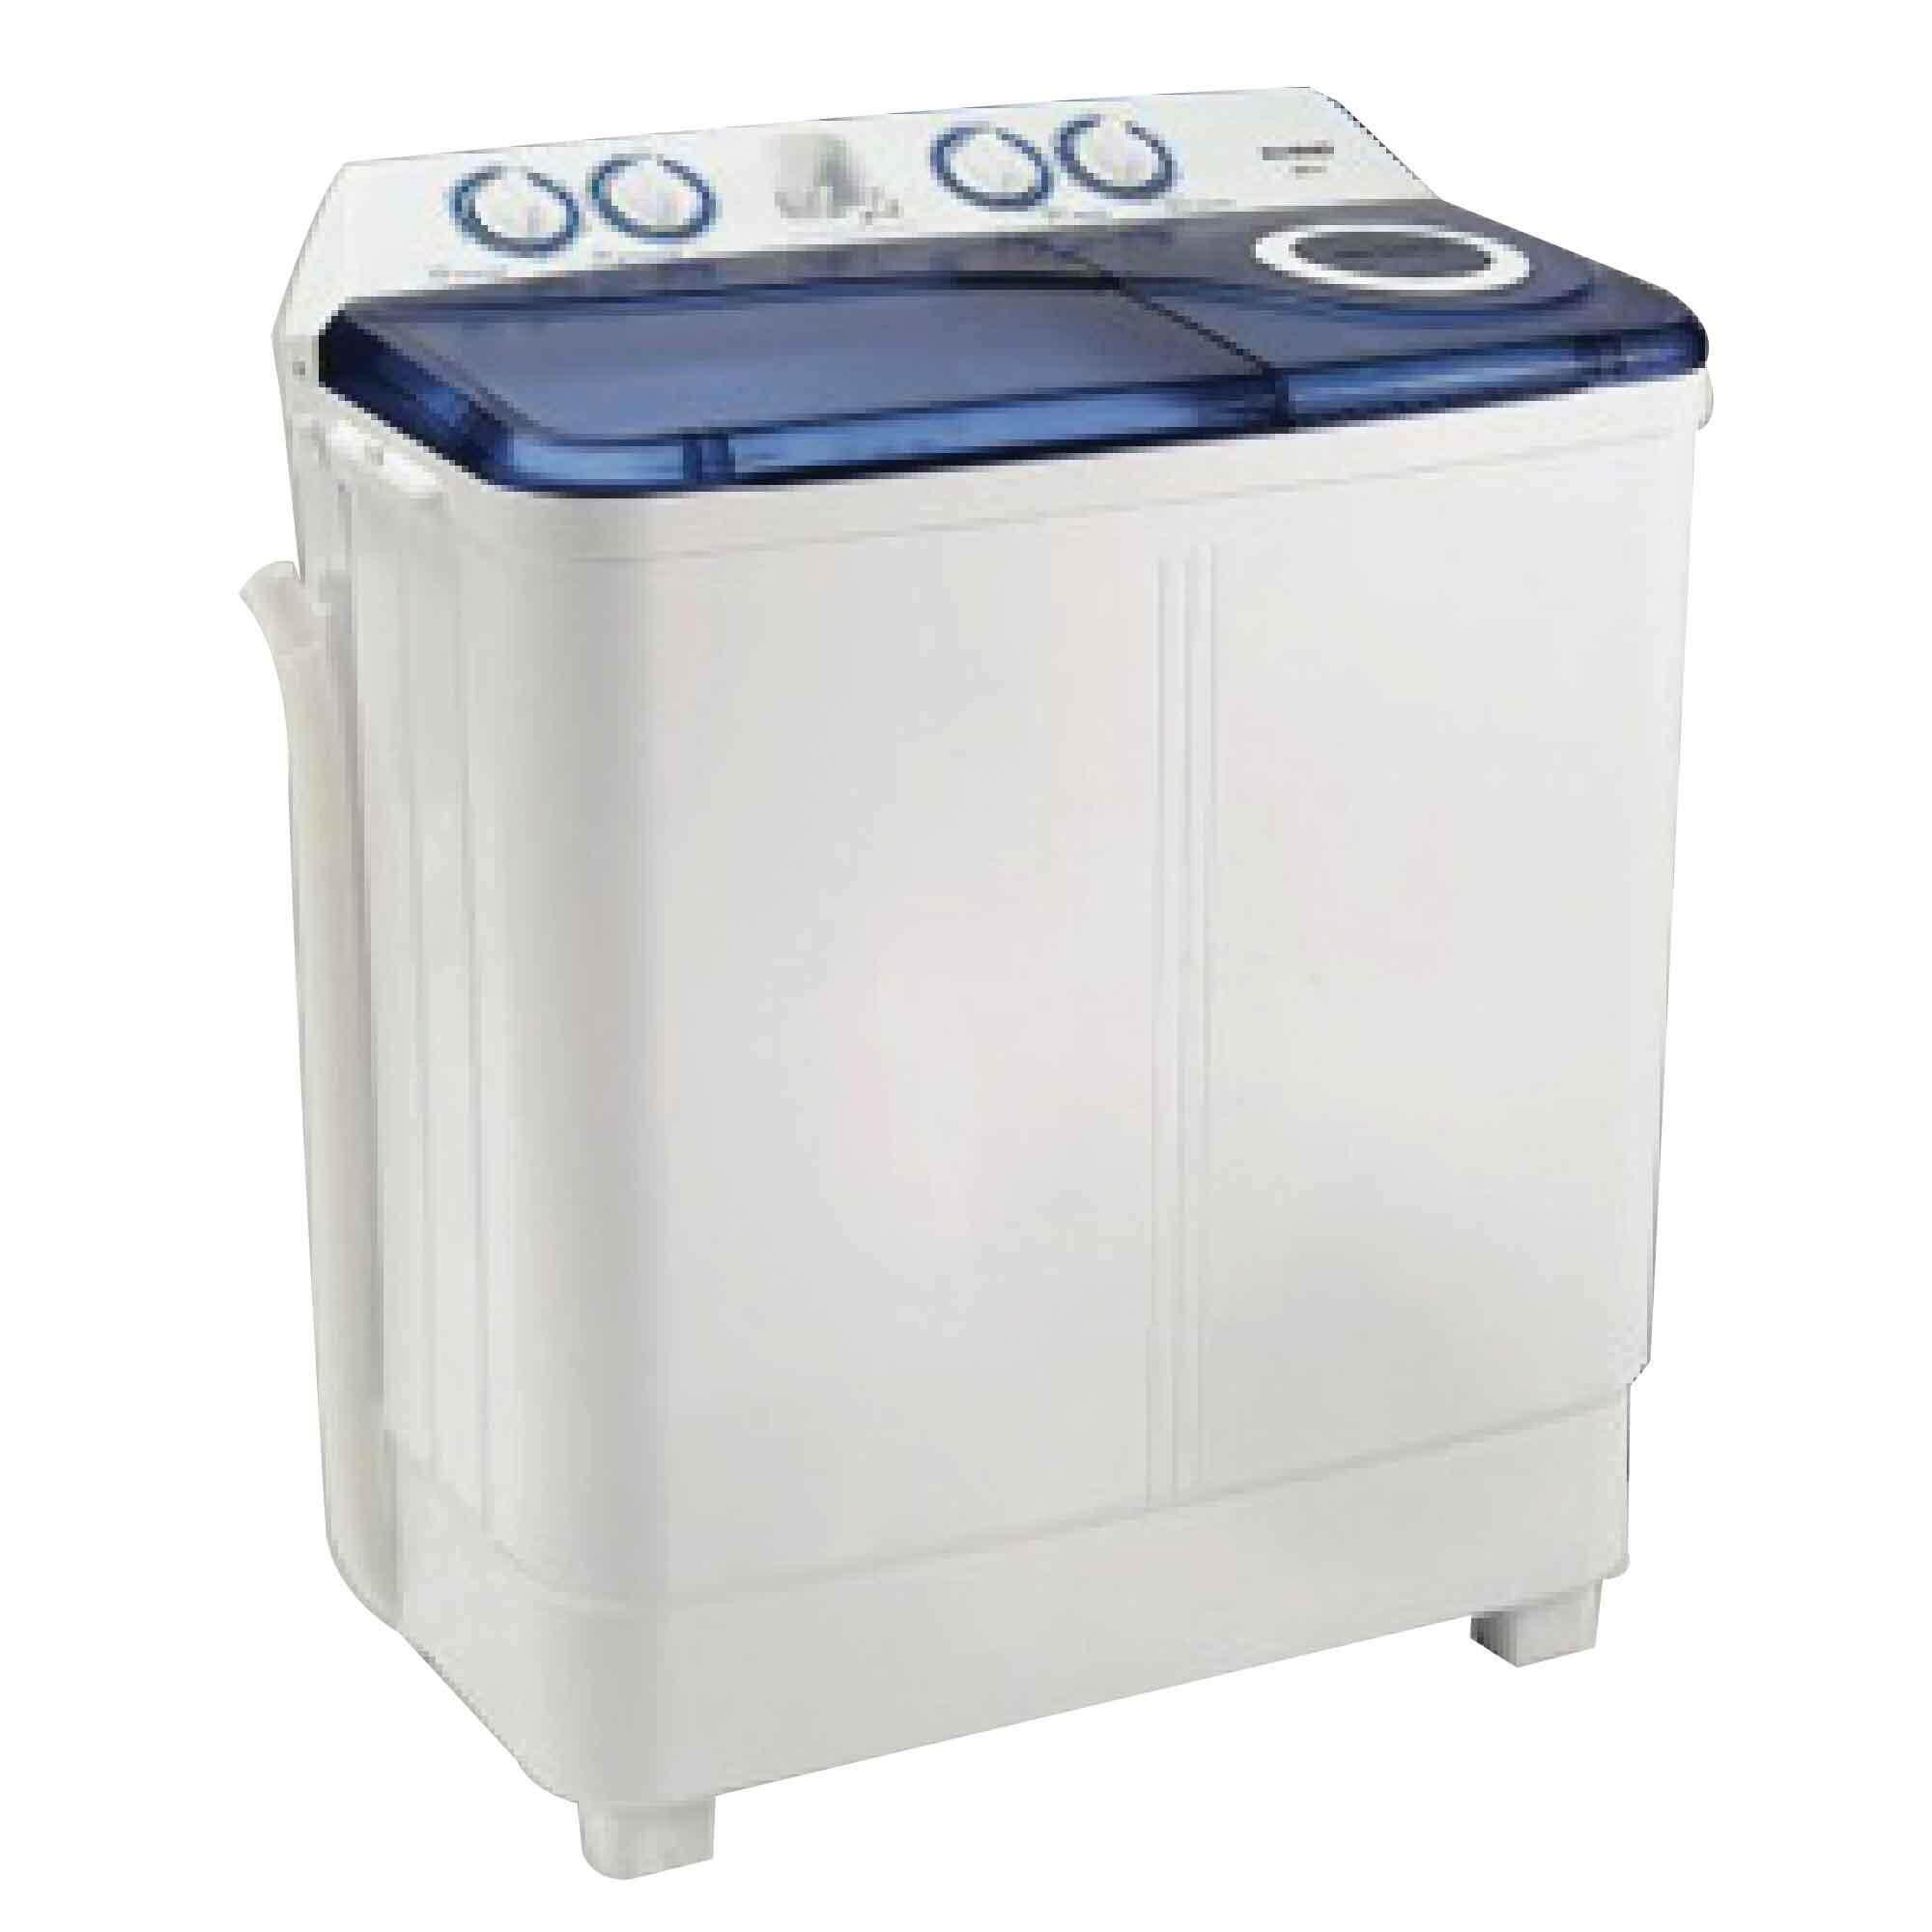 Khind Wm717 7kg Semi Auto Washing Machine Wm-717 By Dsb Online.